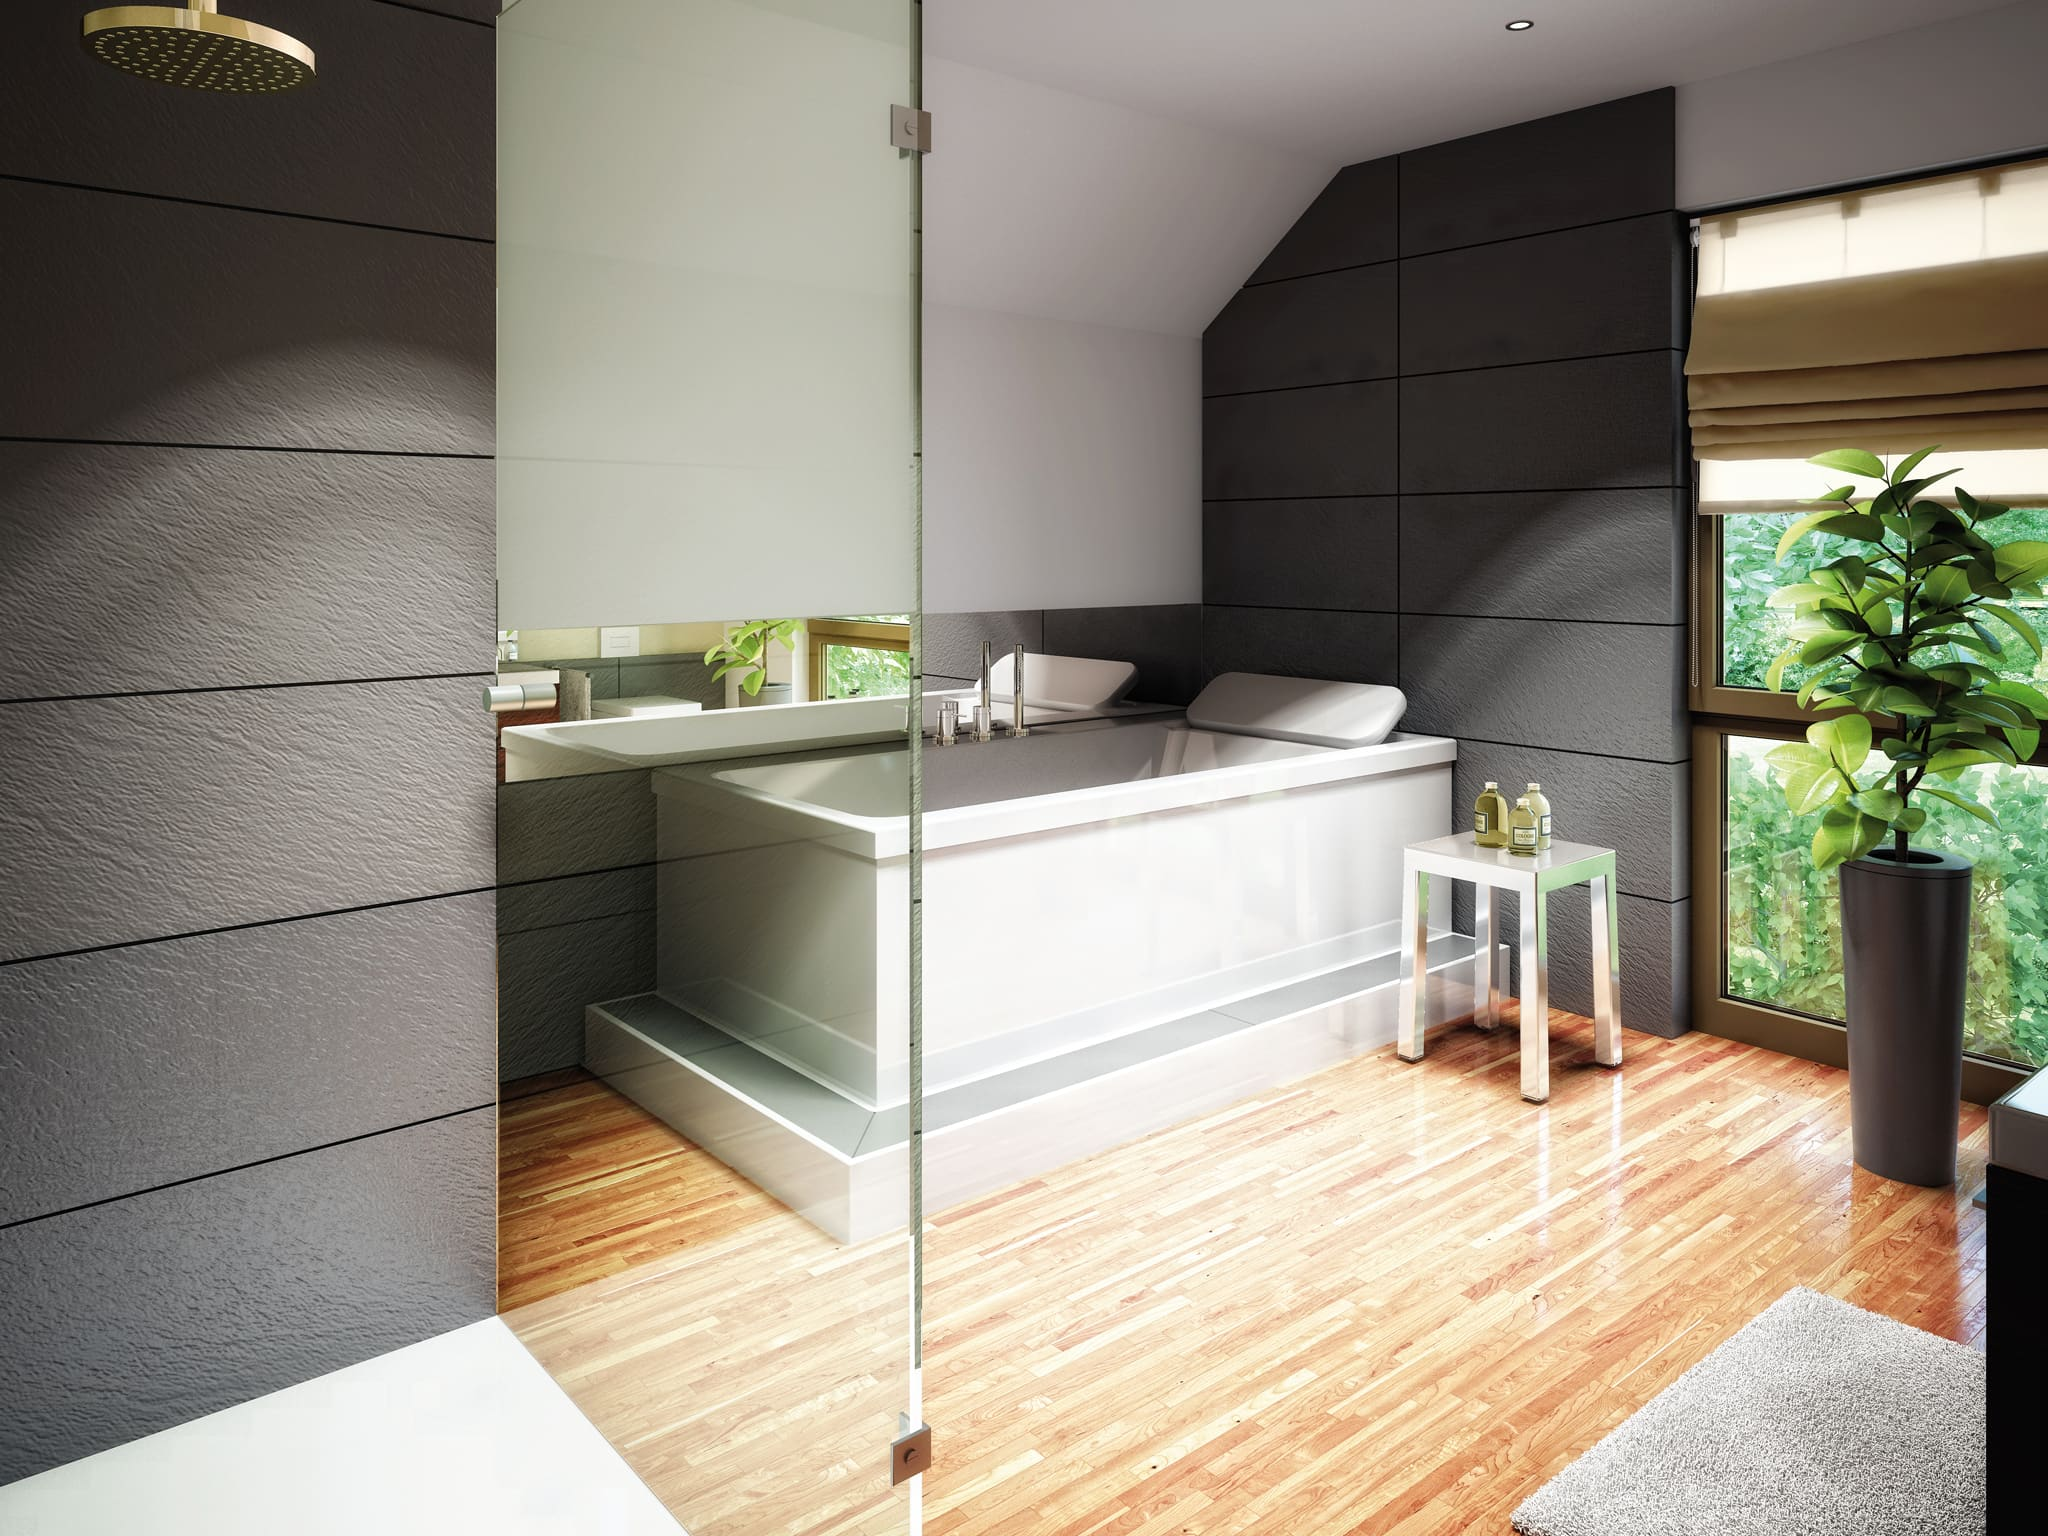 Badezimmer Ideen - Einfamilienhaus Inneneinrichtung Fertighaus Living Haus SUNSHINE 126 V2 - HausbauDirekt.de